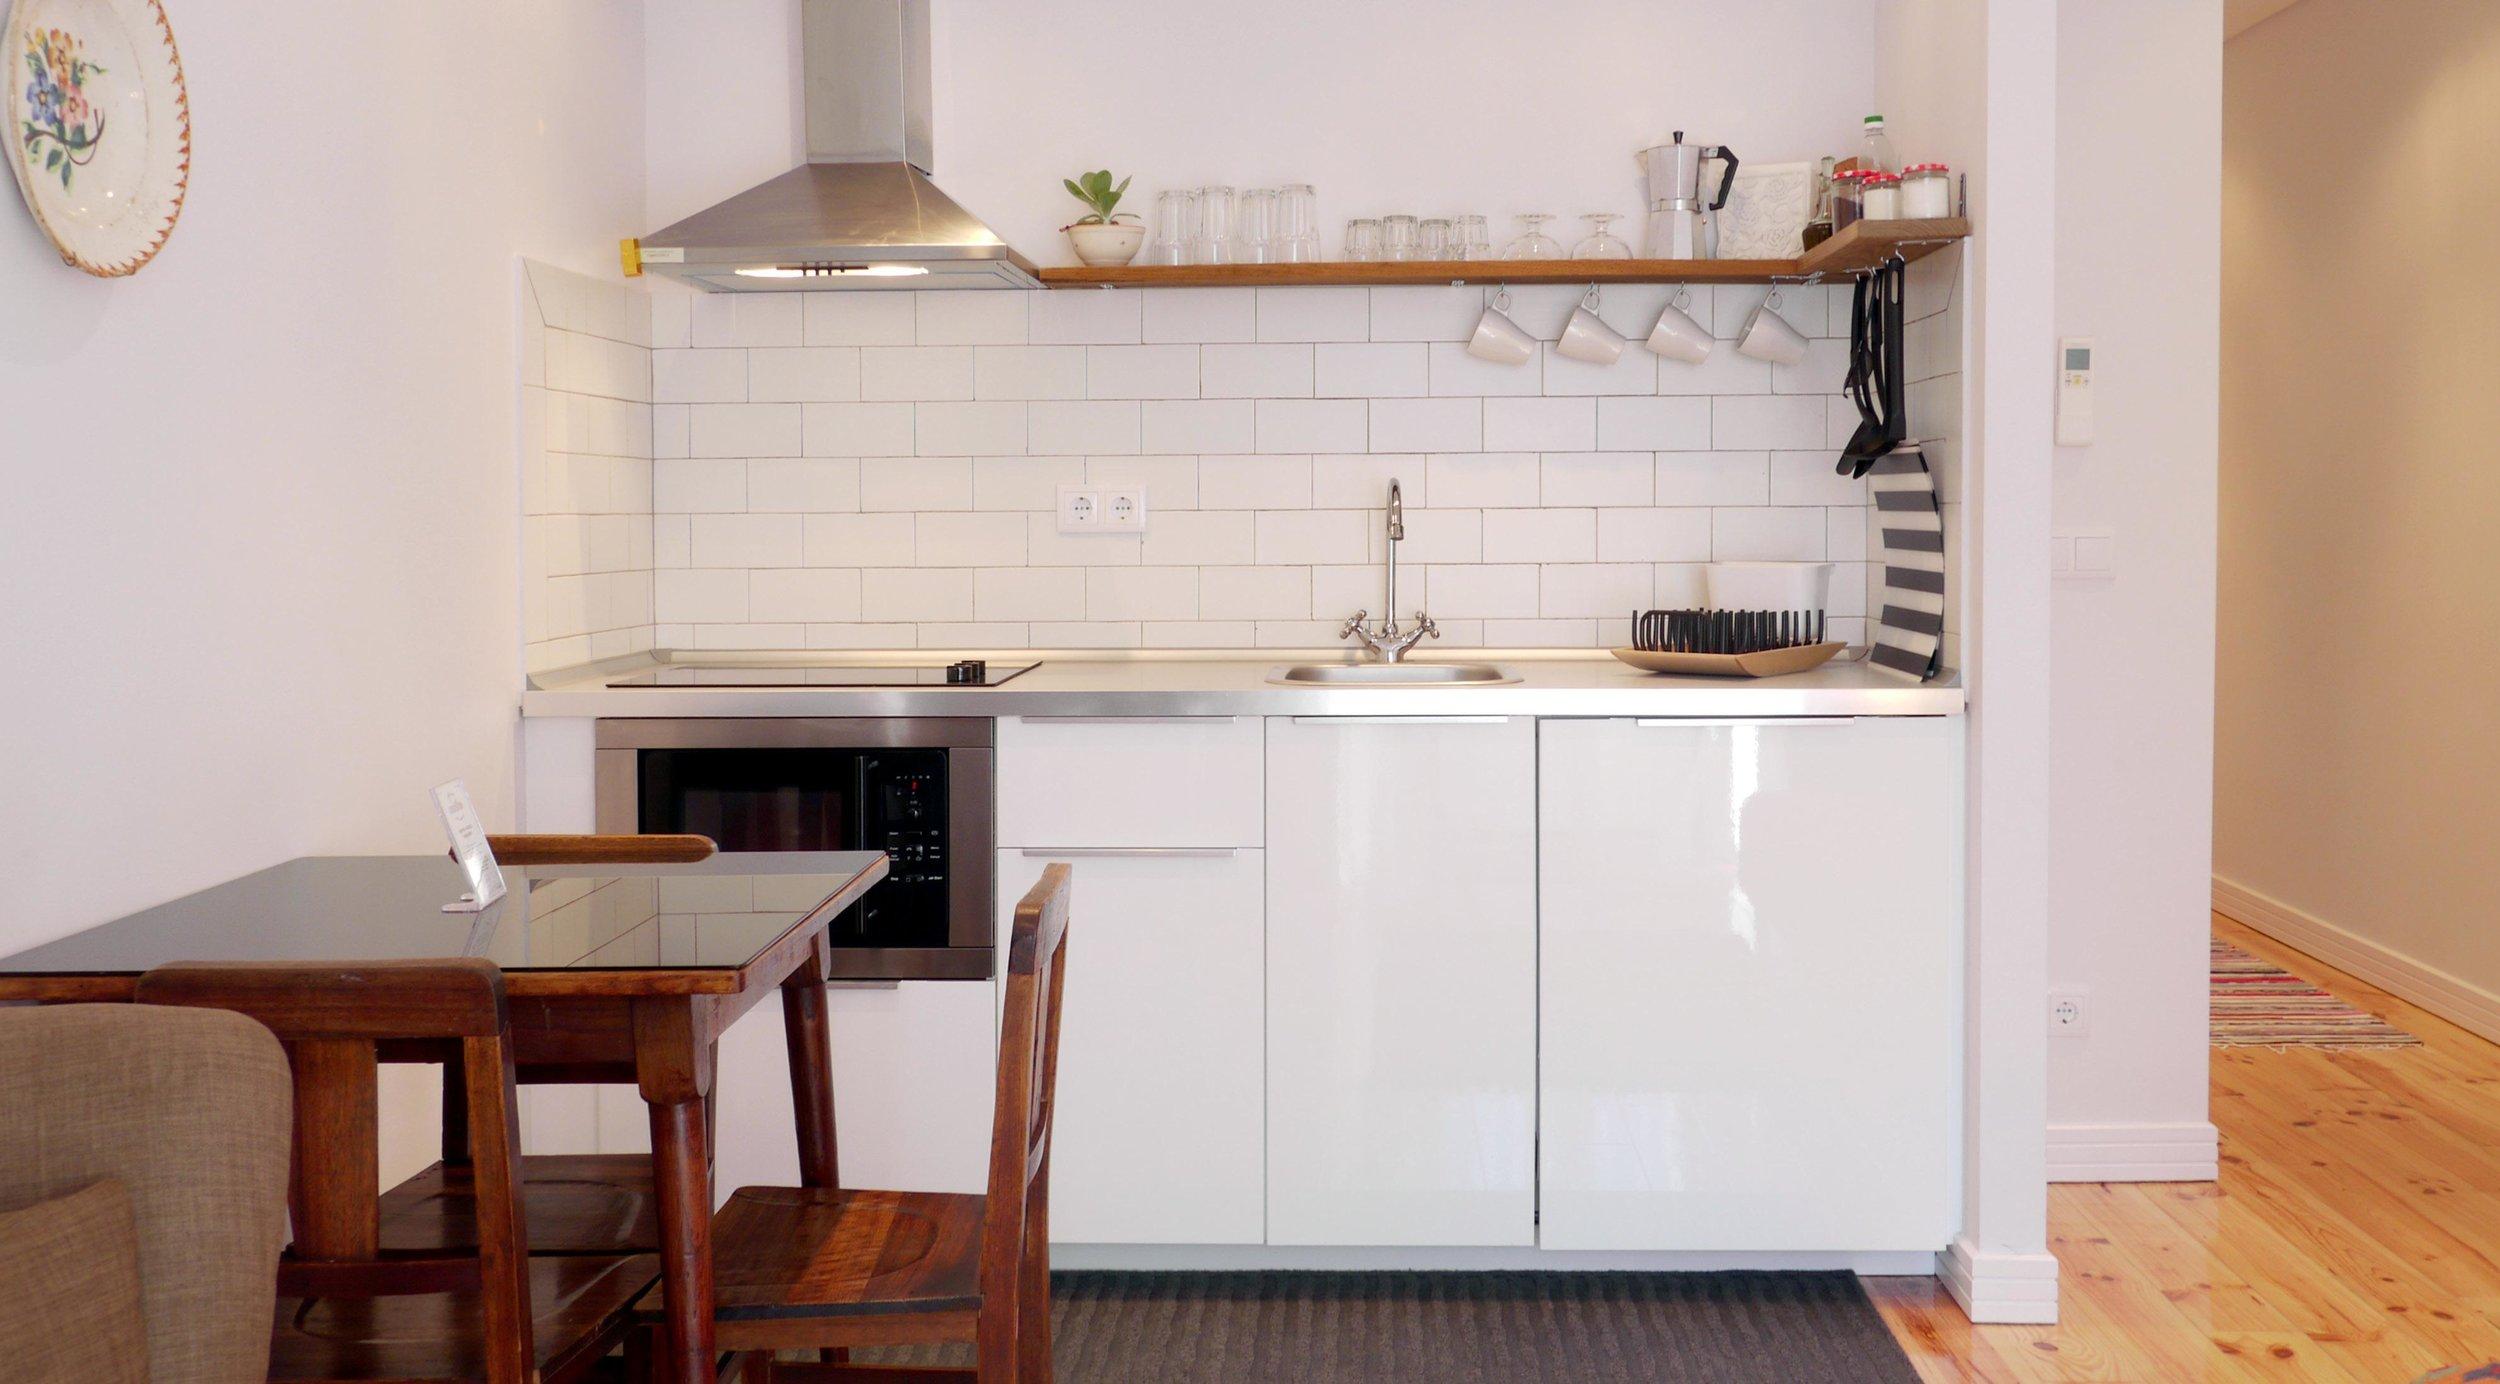 farol cozinha 1.jpg